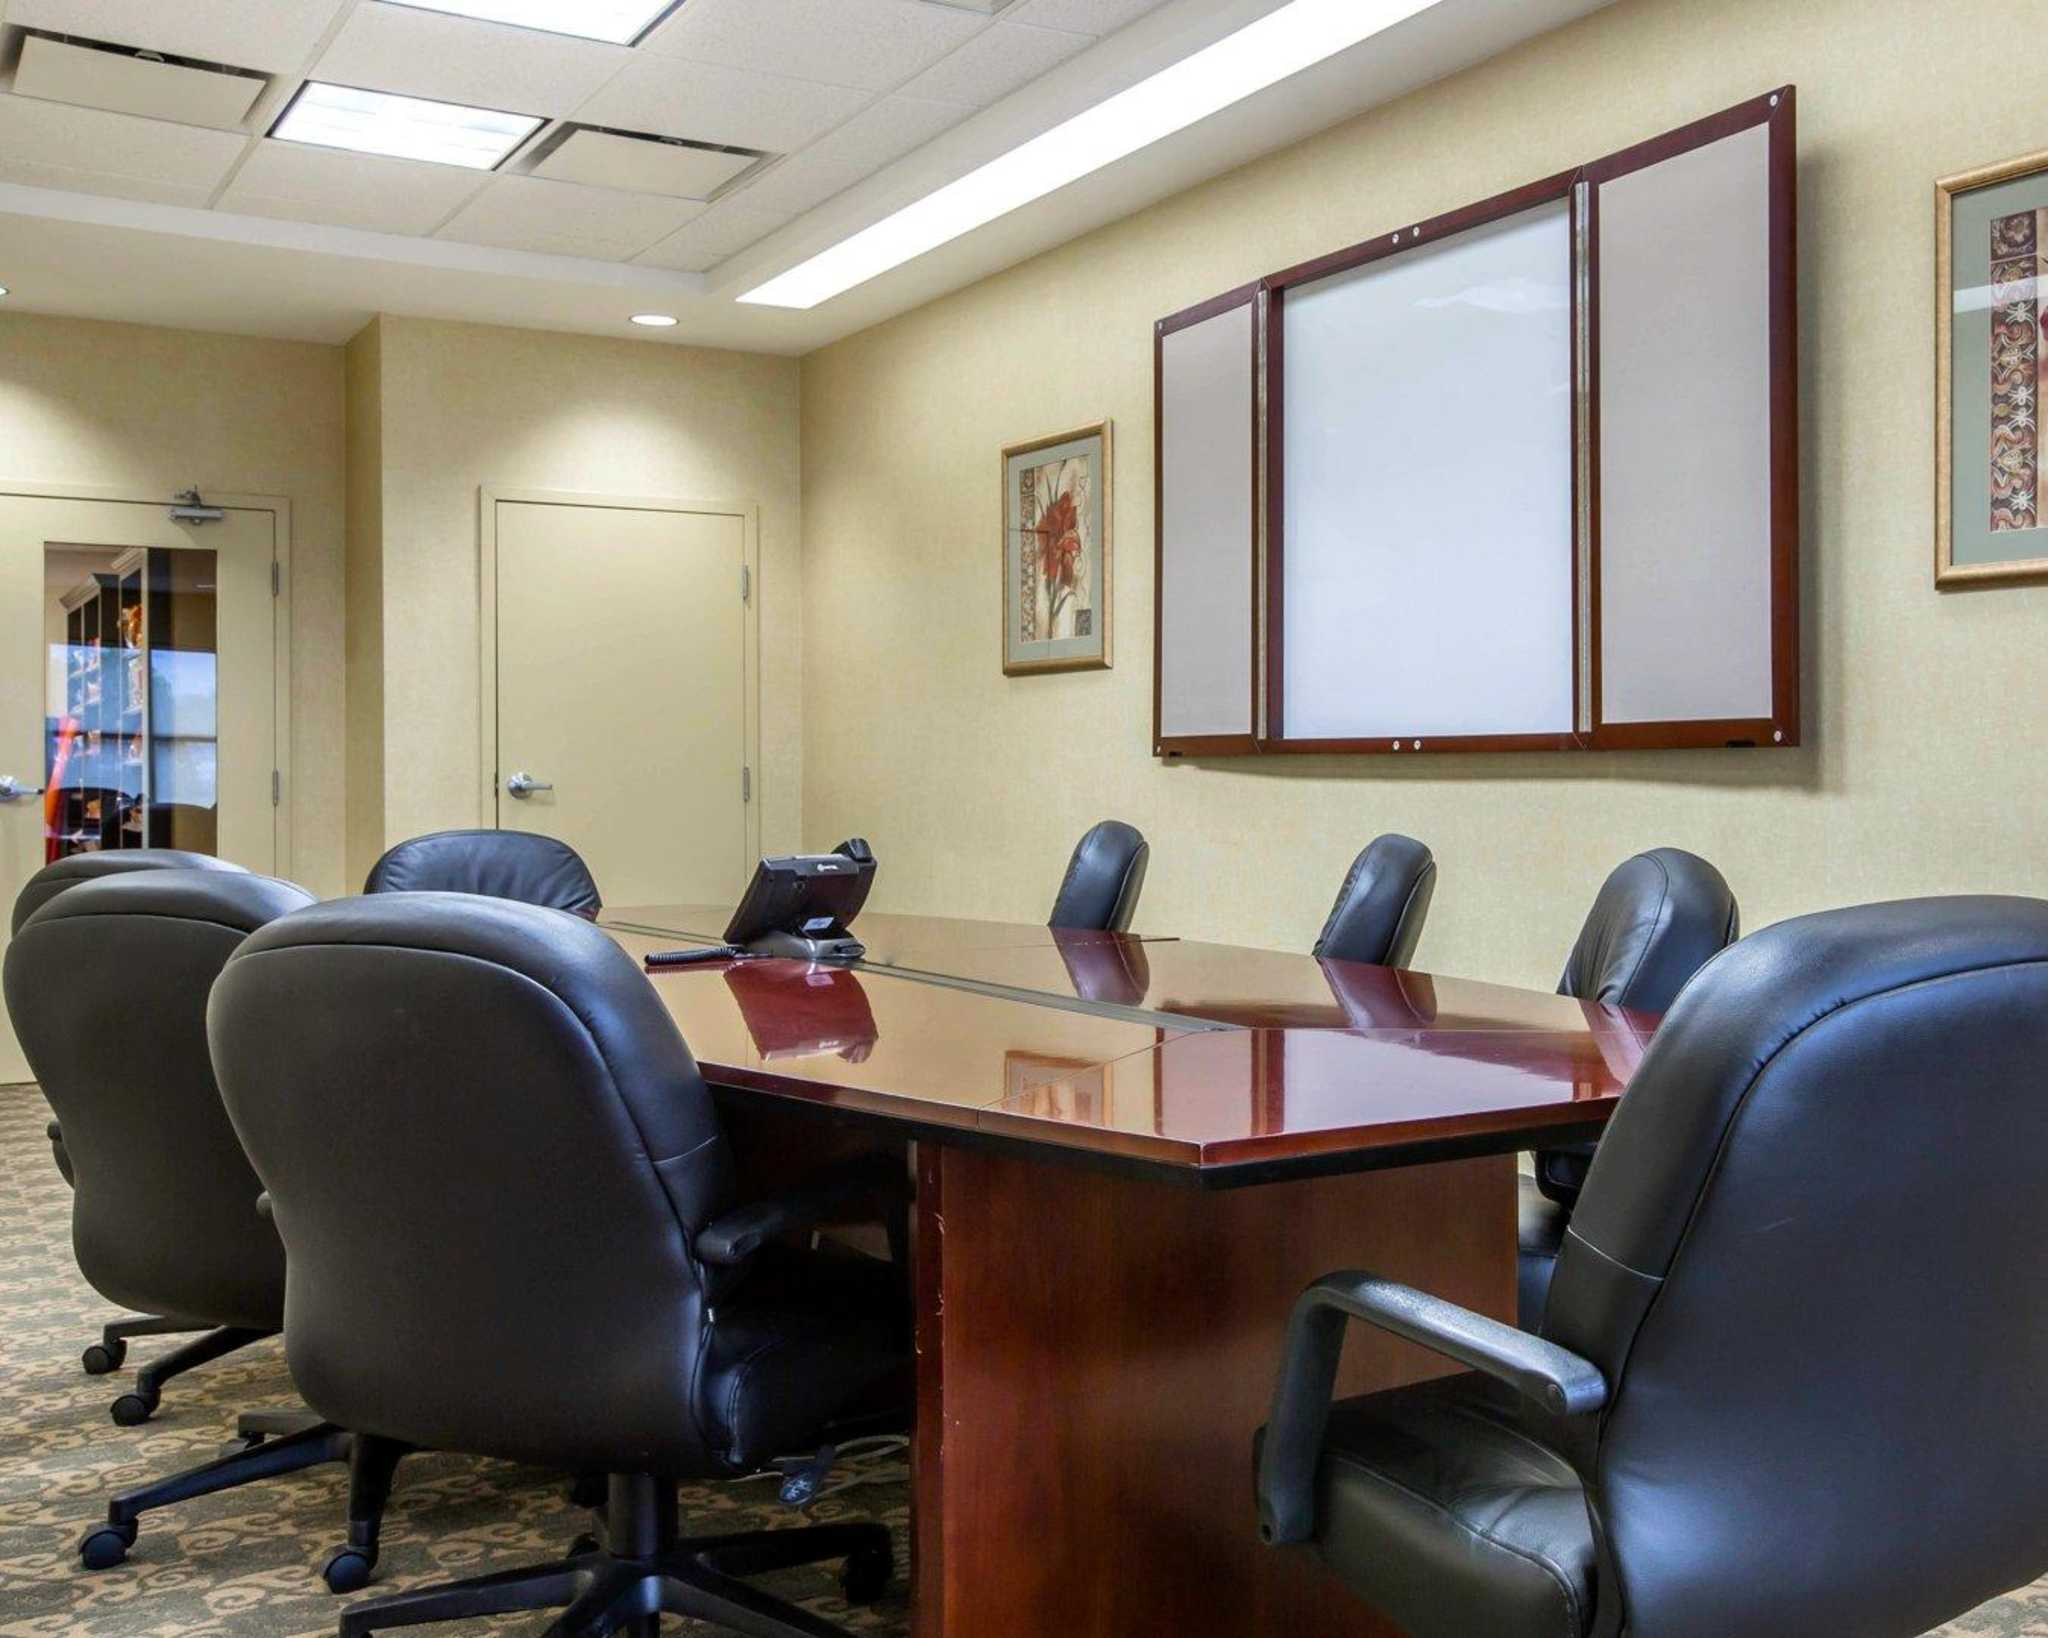 Comfort Inn & Suites adj to Akwesasne Mohawk Casino image 33